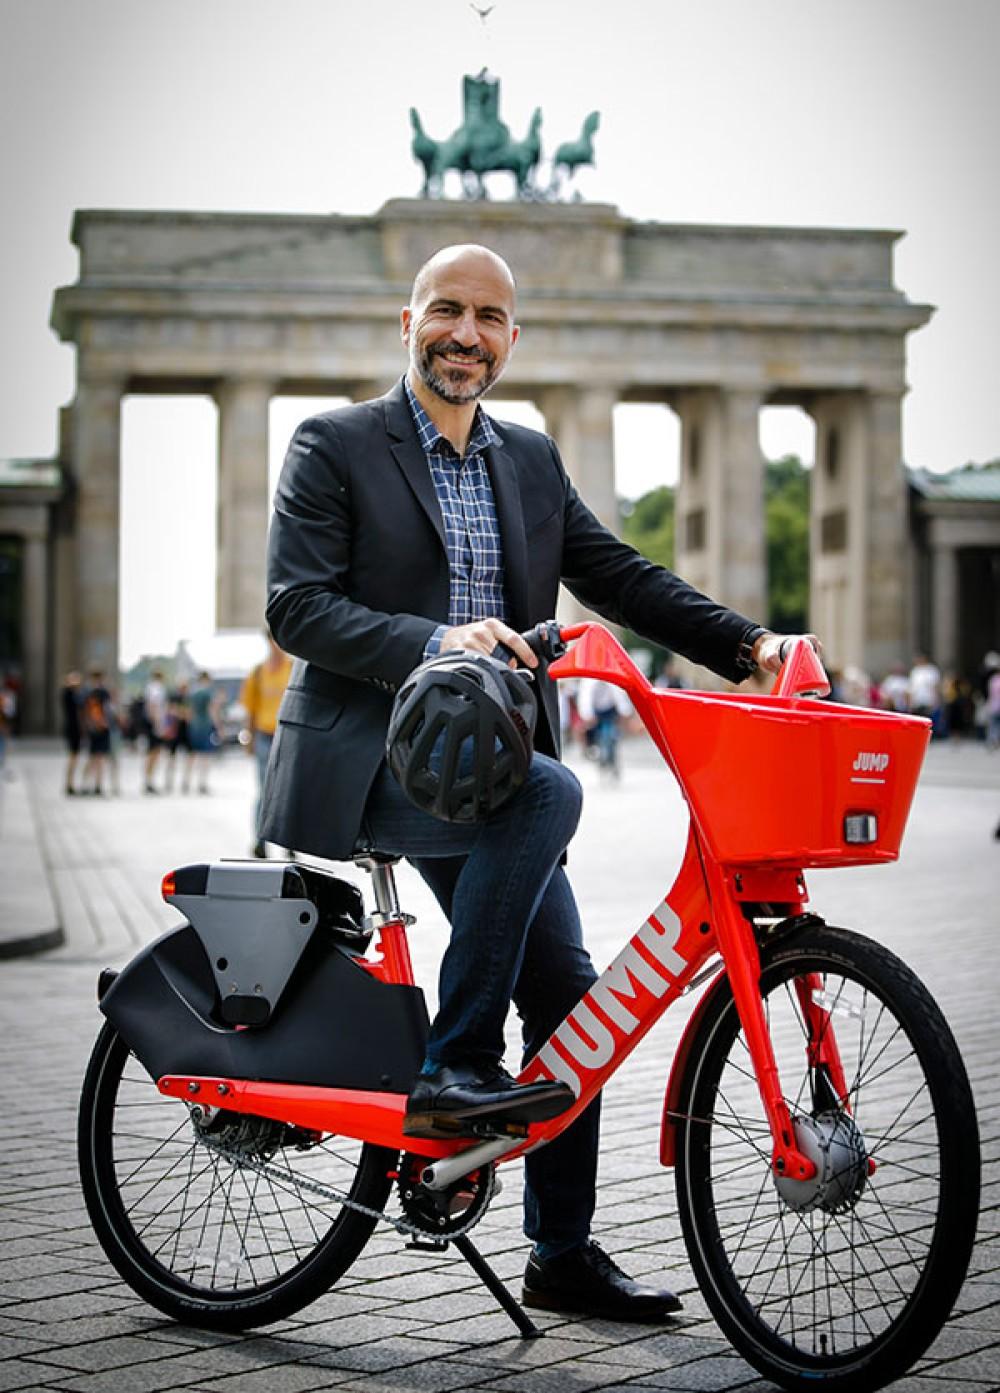 Uber JUMP: Η υπηρεσία bike-sharing λανσάρεται και στην Ευρώπη